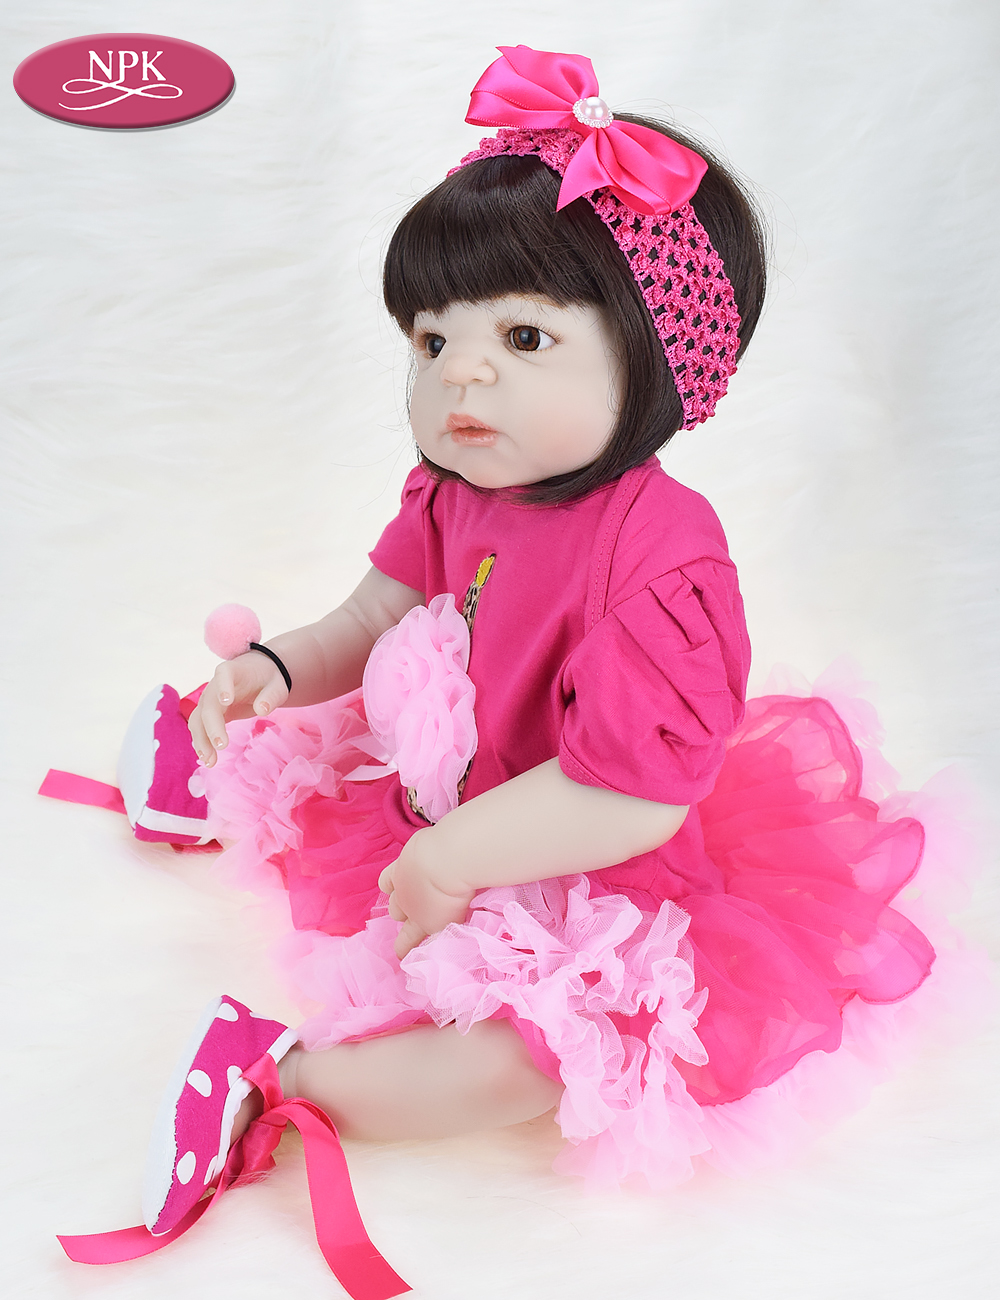 NPK 57CM Full Body Soft Silicone Girls Reborn Baby Doll Bathe Toys Lifelike Princess Girl Dolls Bebe Real Reborn Boneca Menina  (6)